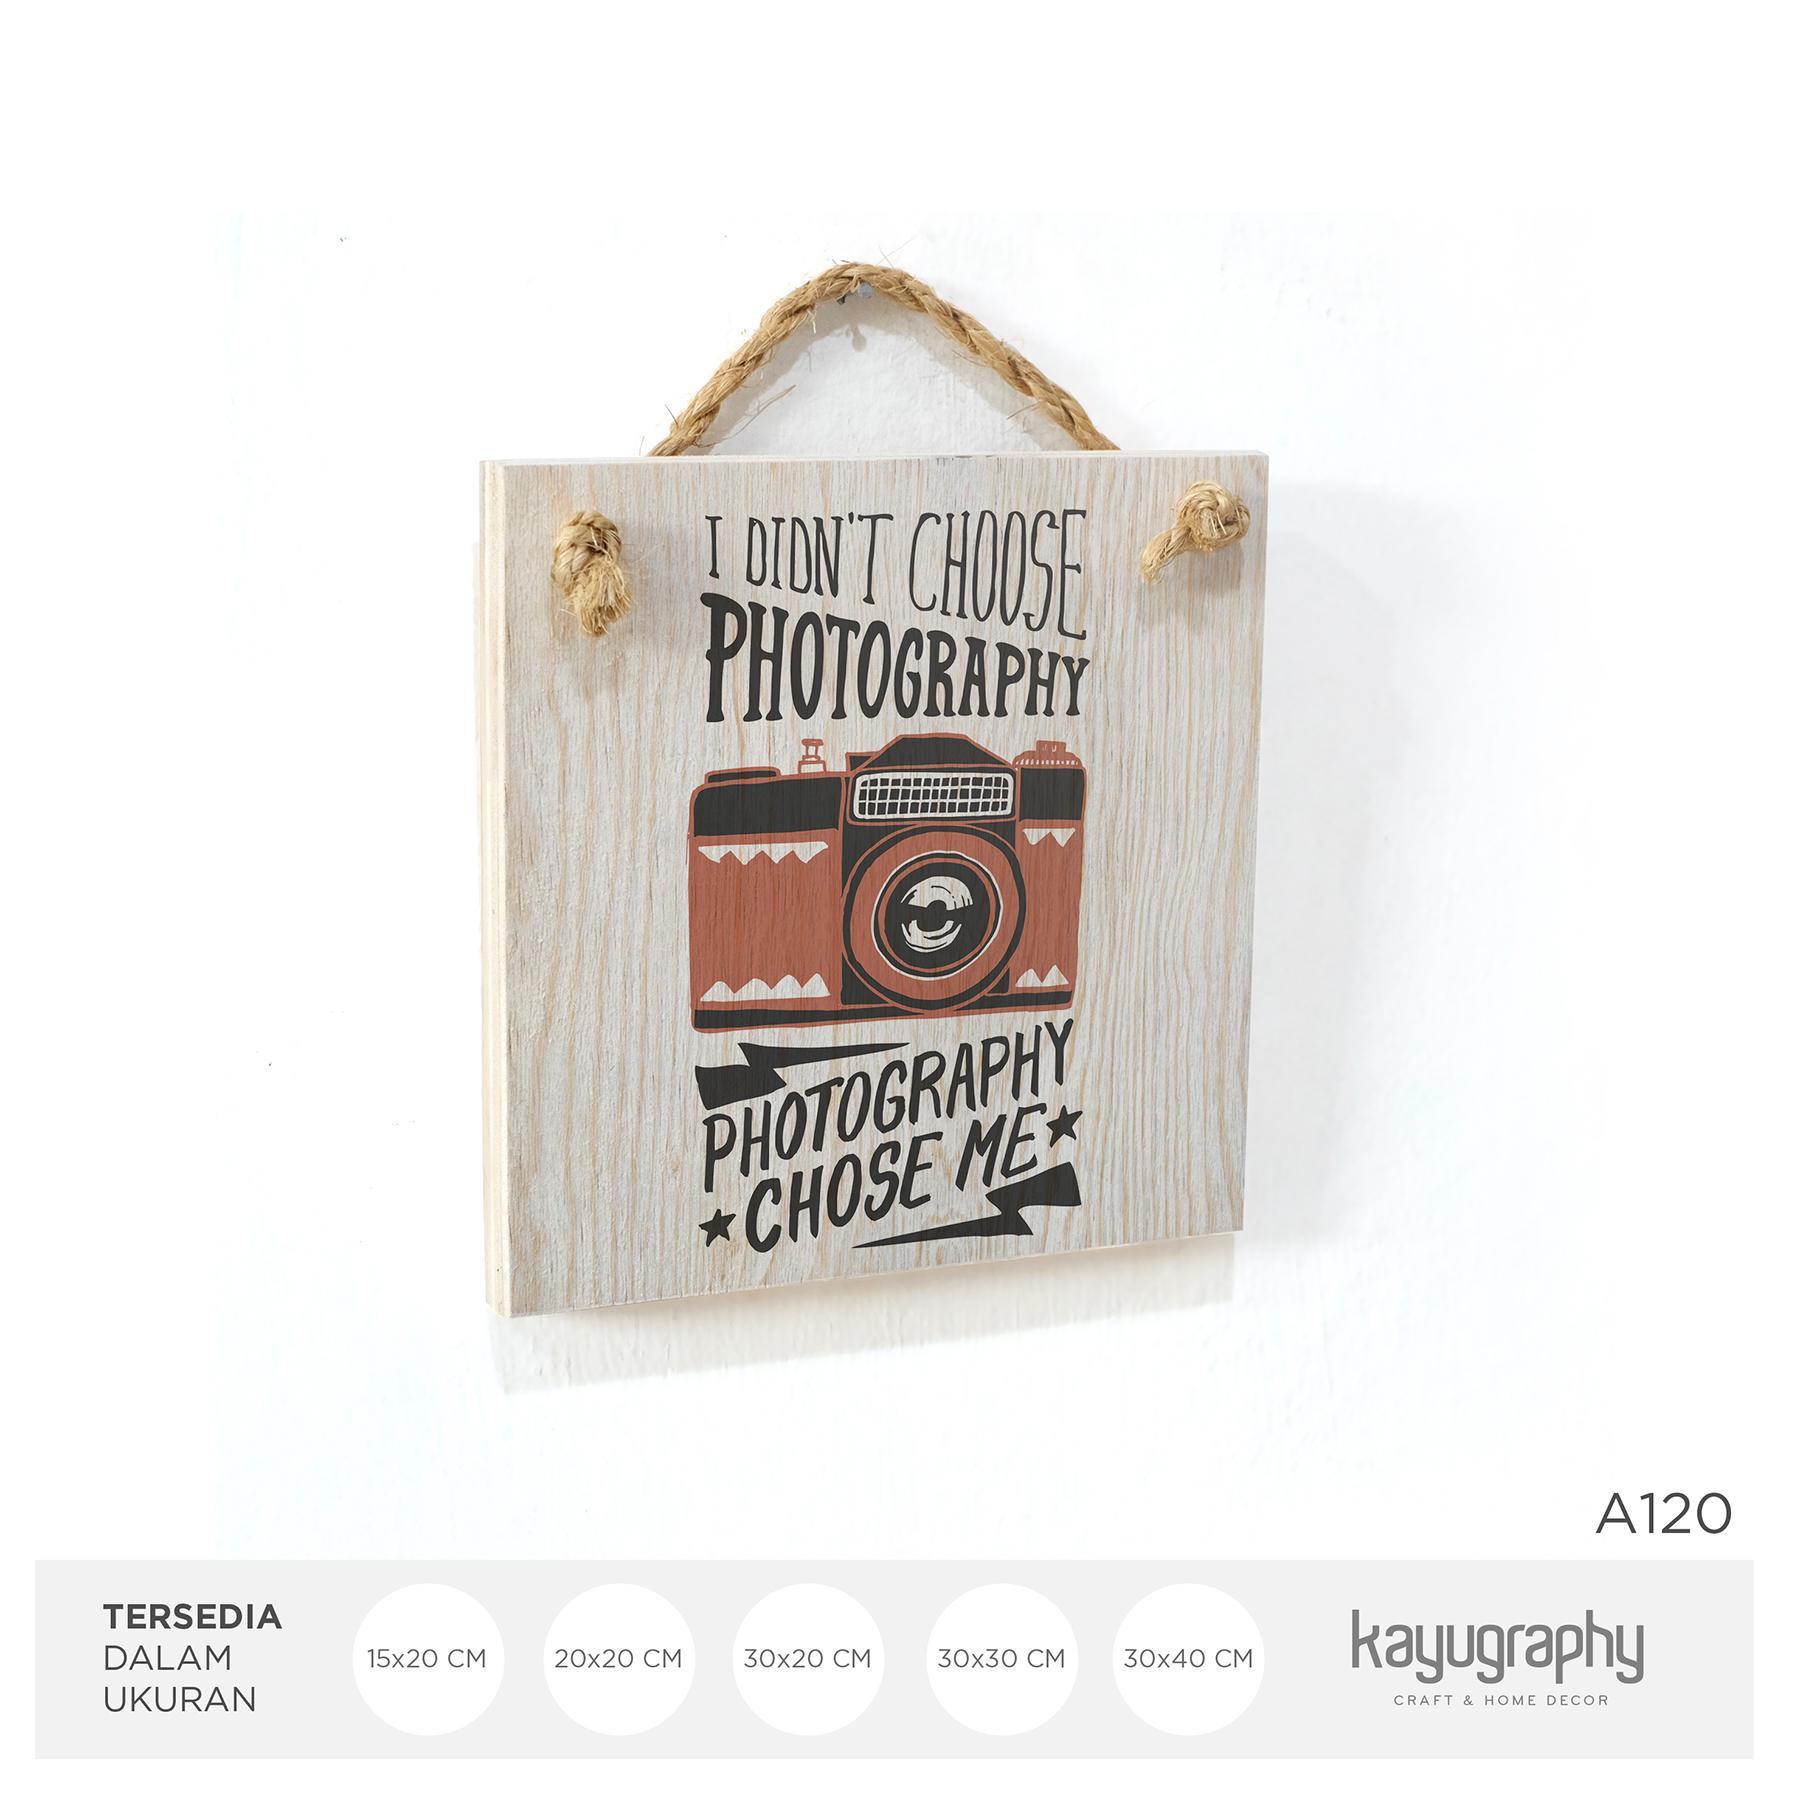 Berguna Tahan Setrika Kain Pelindung Isolasi Pad Rumah Jasa Tatakan Poster Kayu Quote Hiasan Dinding Unik Wooden Vintage Kata Motivasi 20x20cm A120